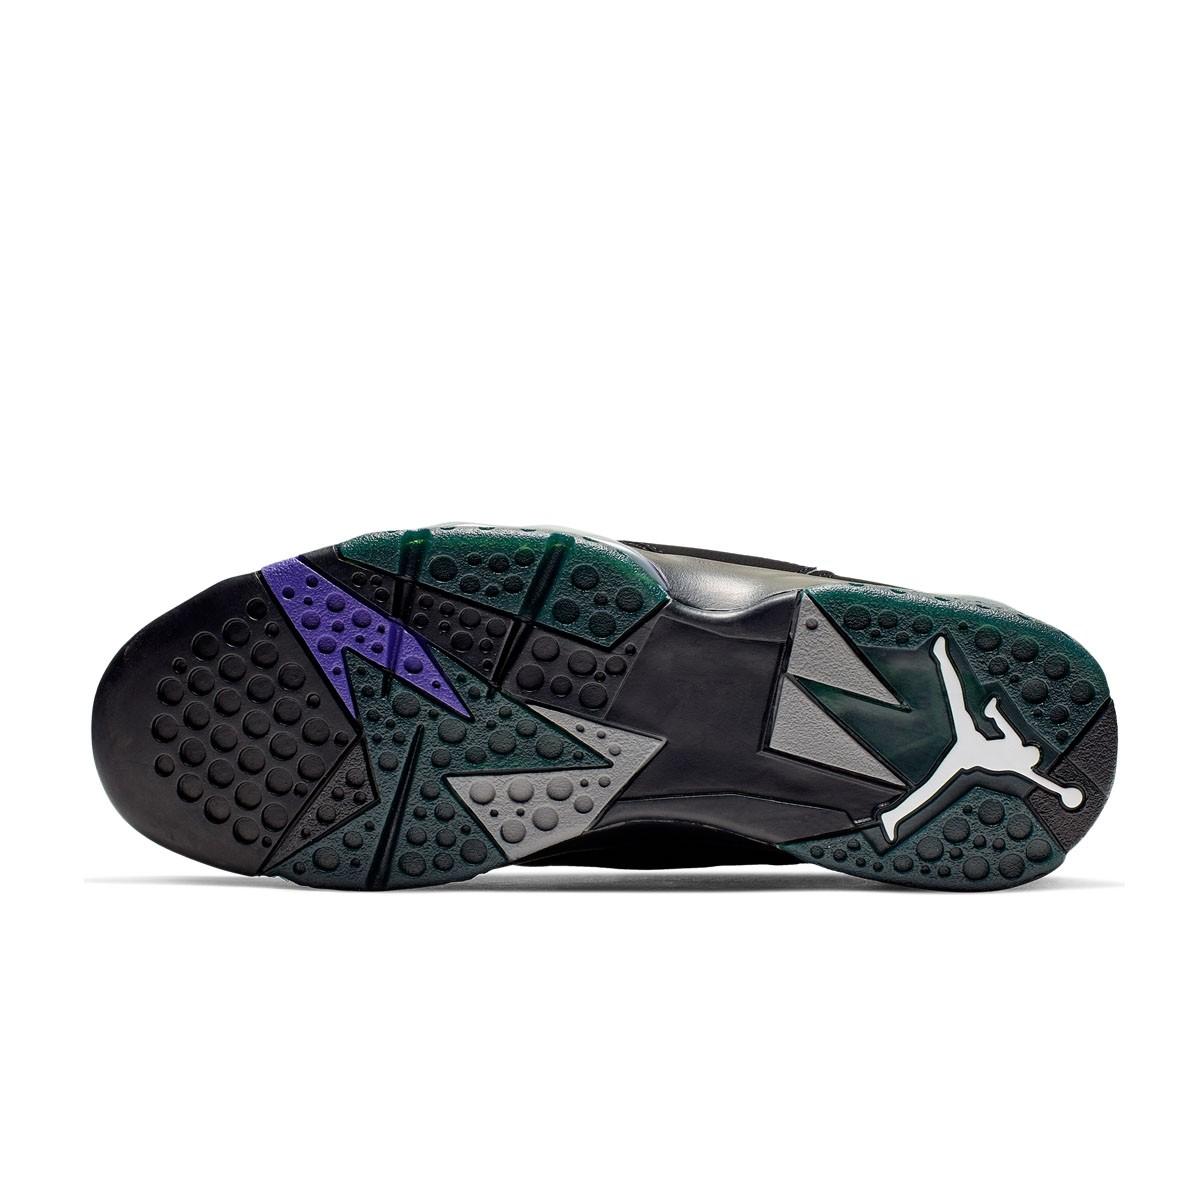 Air Jordan 7 'Ray Allen' 304775-053